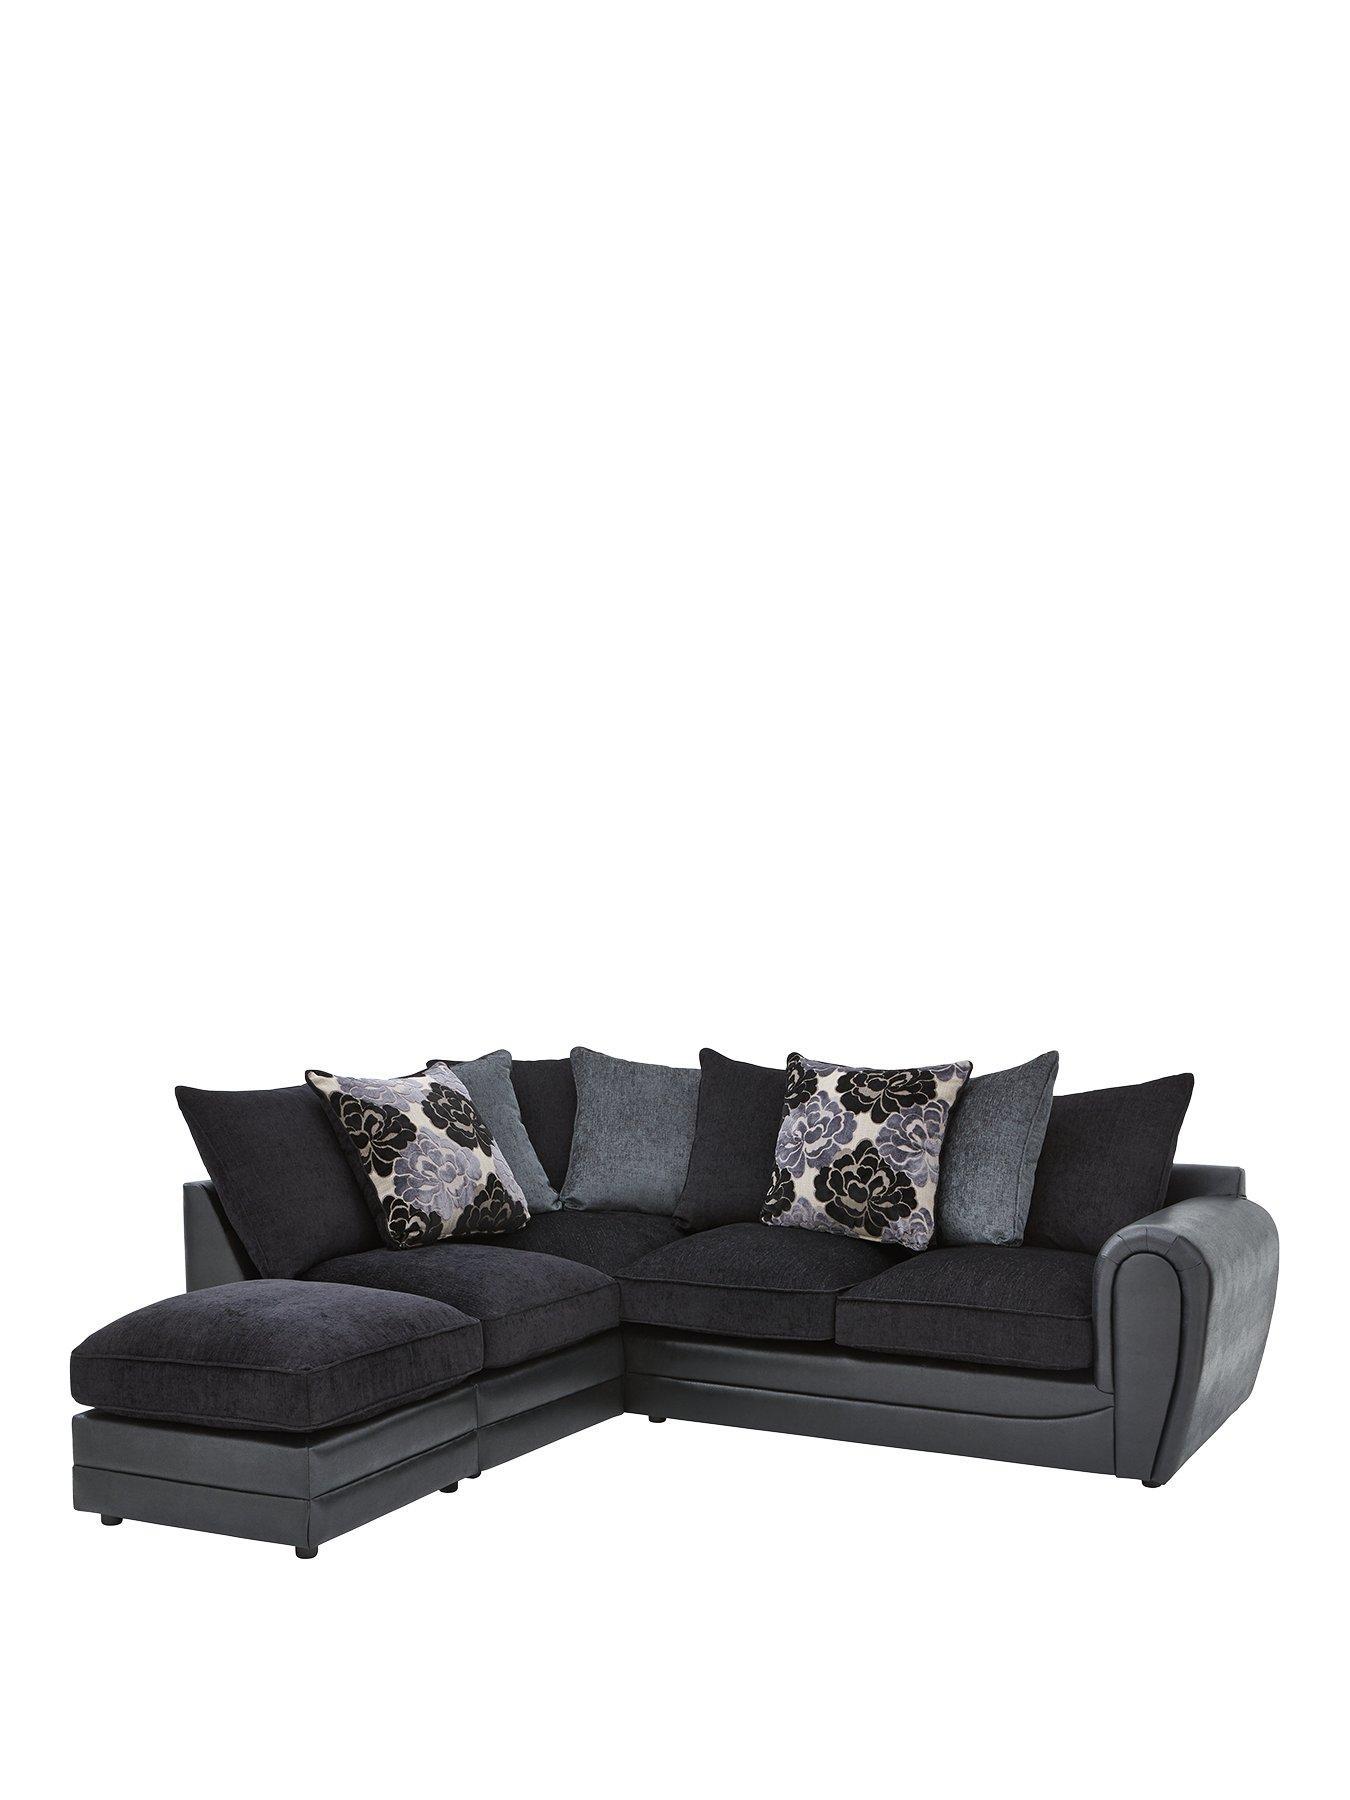 monico left hand single arm scatter back corner chaise sofa footstool